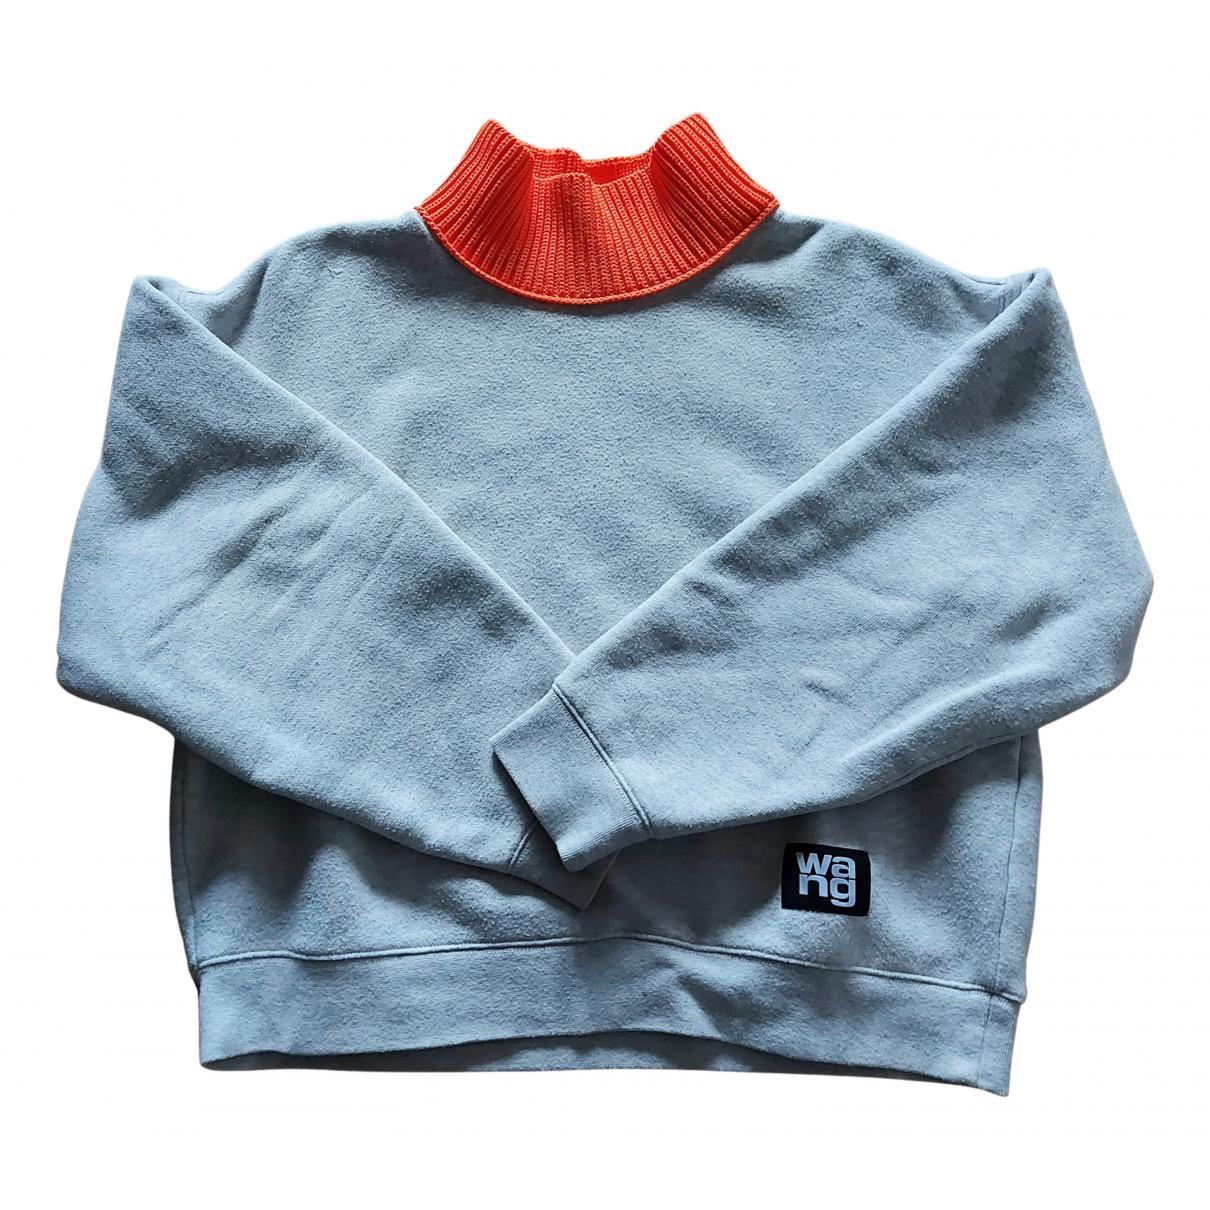 Alexander Wang N Grey Cotton Knitwear for Women 40 FR